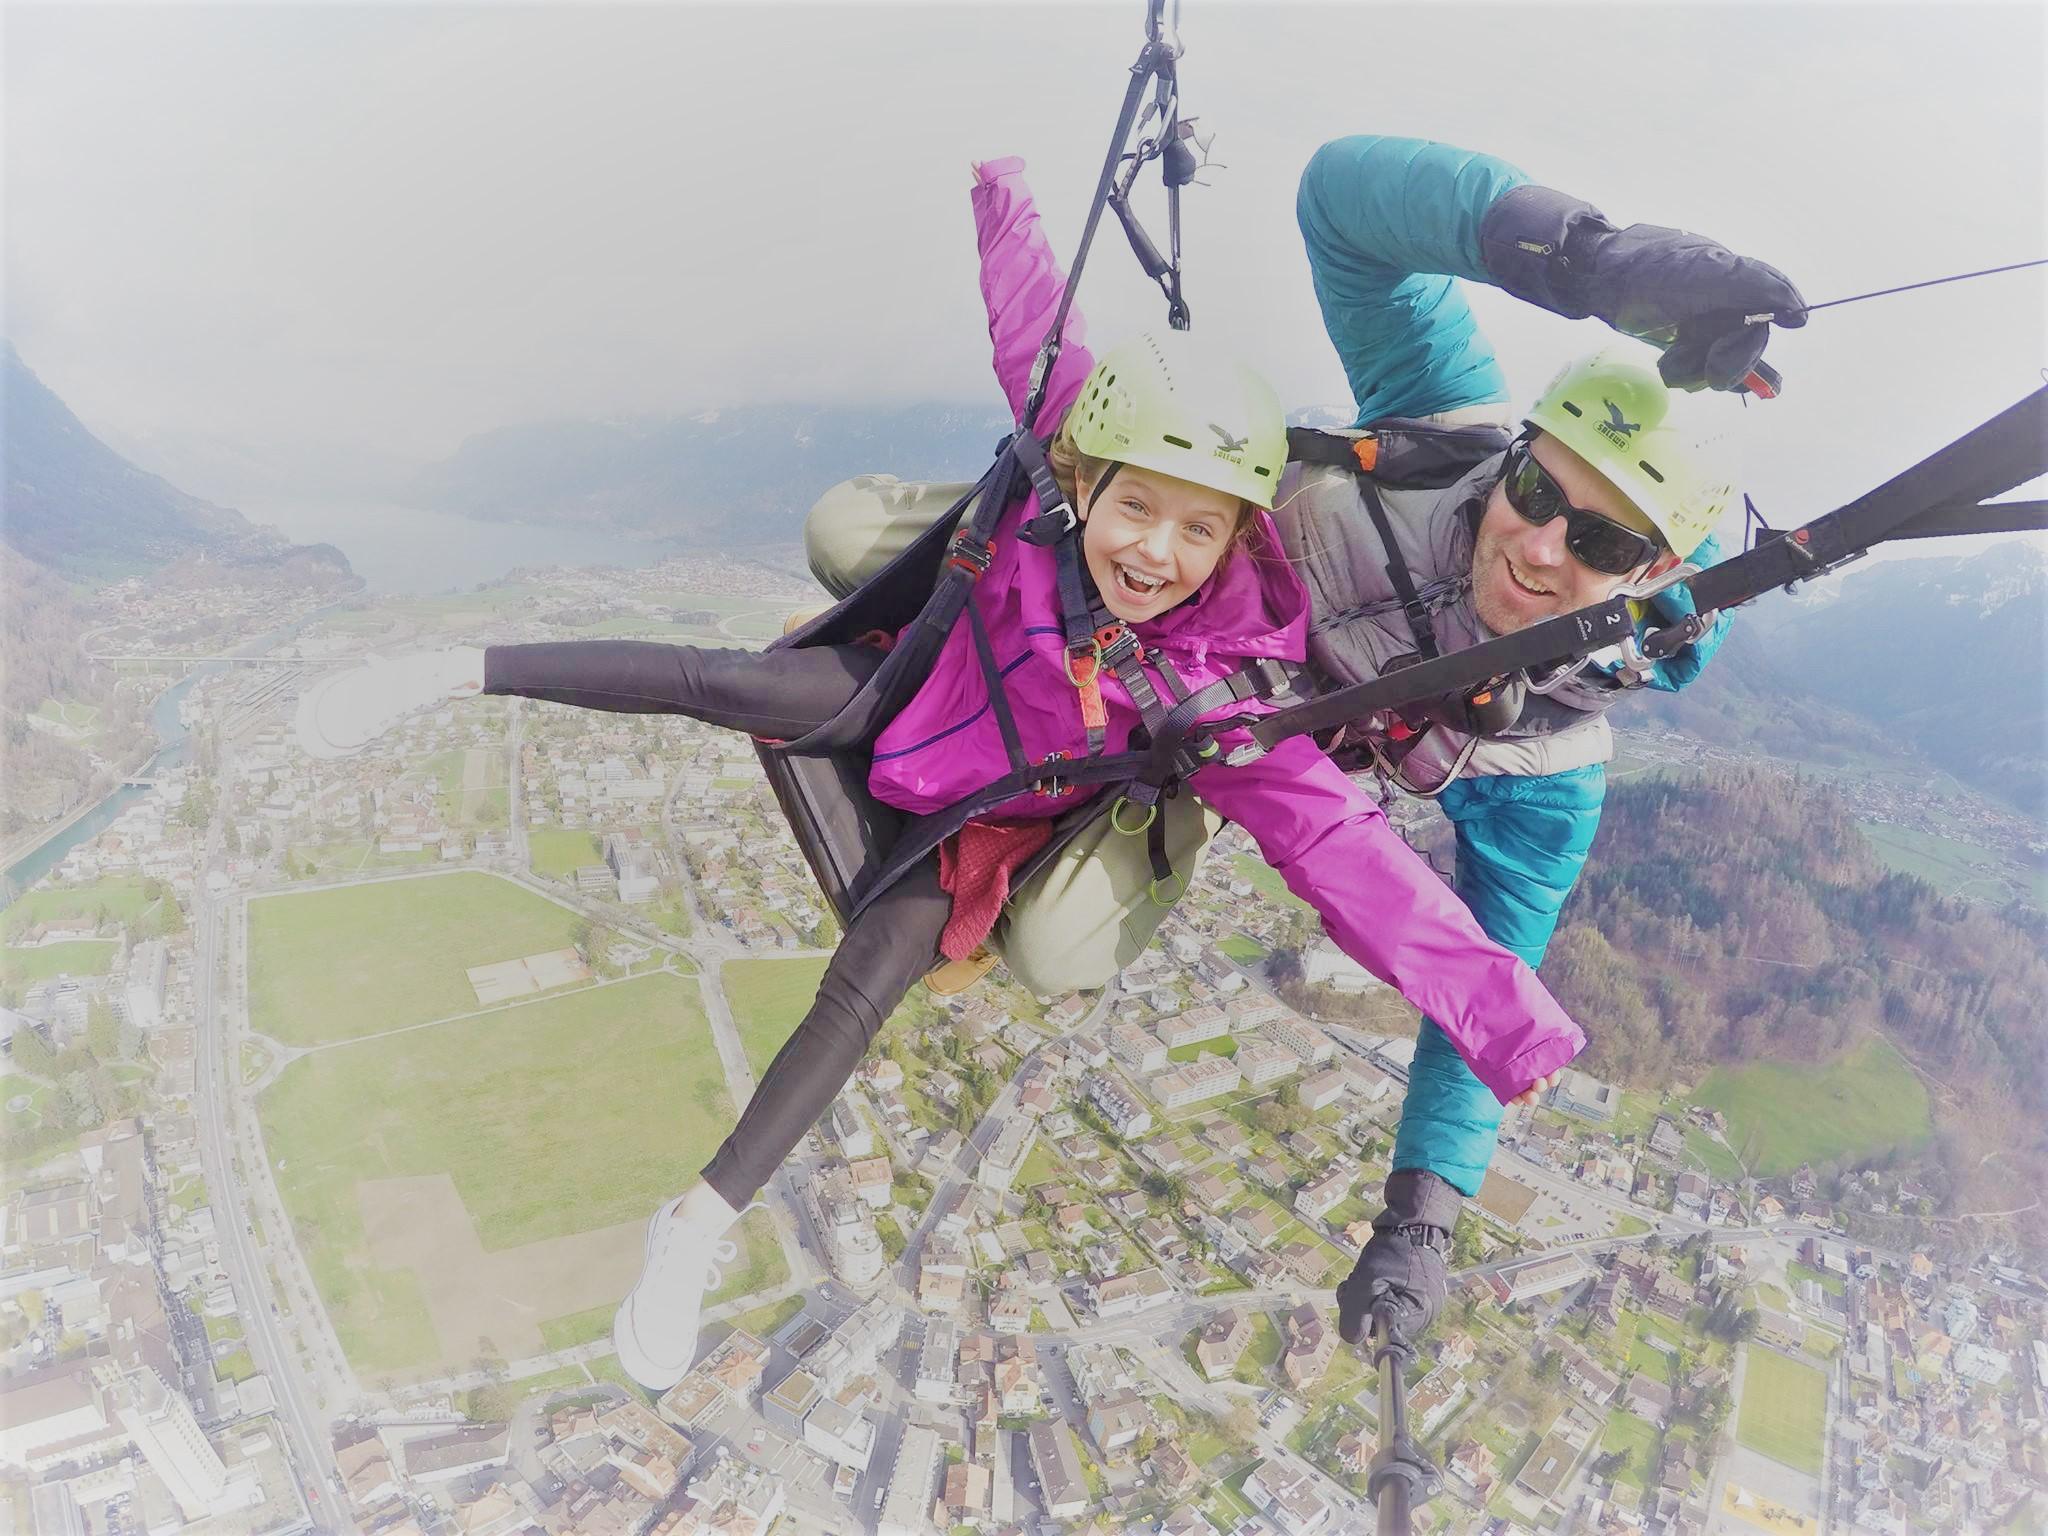 Paragliding with kids Interlaken big smiles (Icarus) - Copy